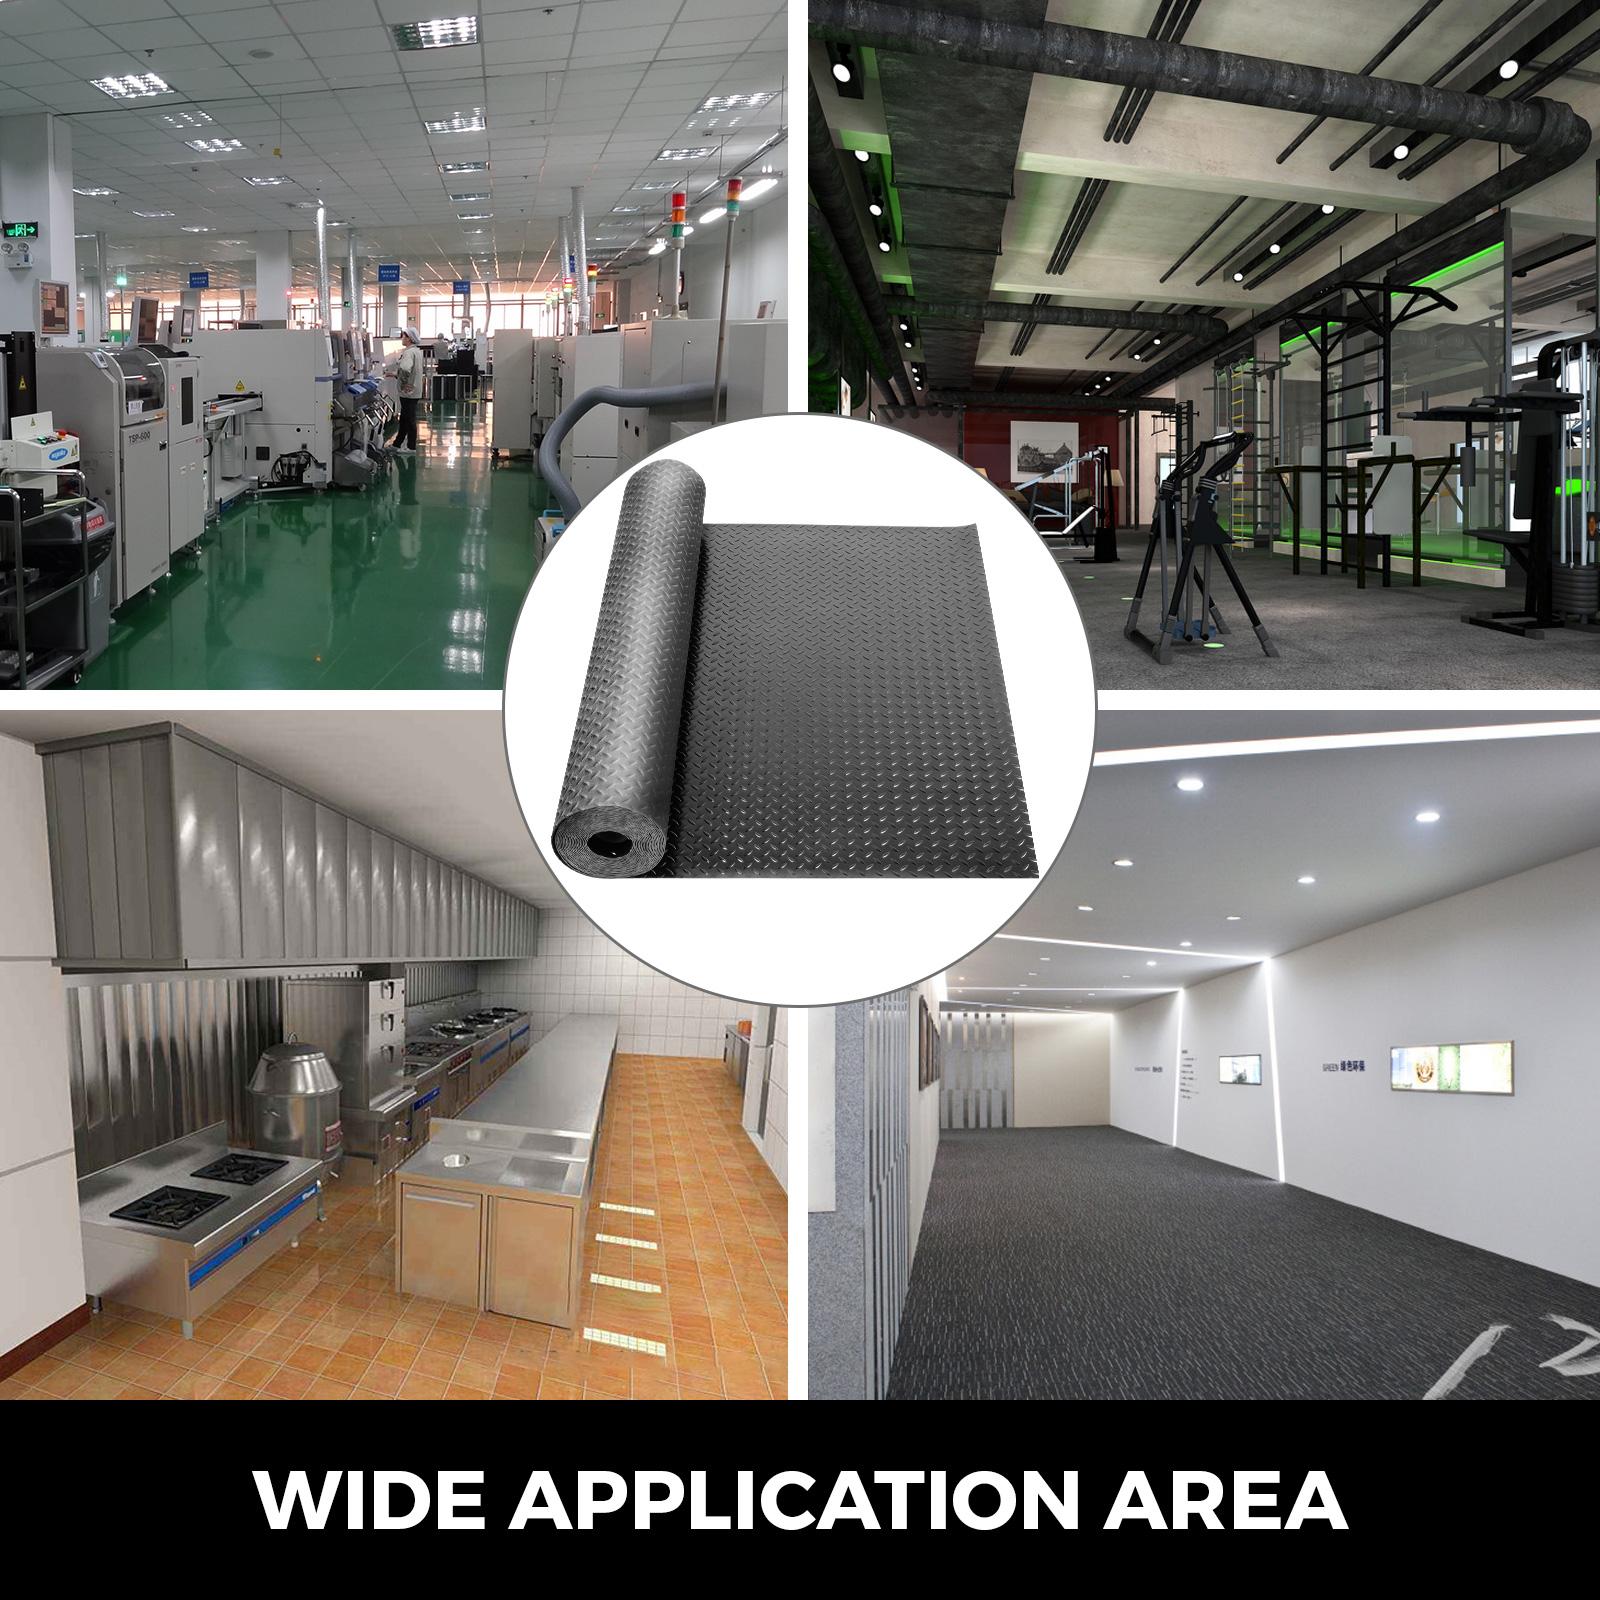 thumbnail 103 - Garage Flooring Mat Roll Car Trailer Floor Covering 1.1m Width Gym Floor Roll